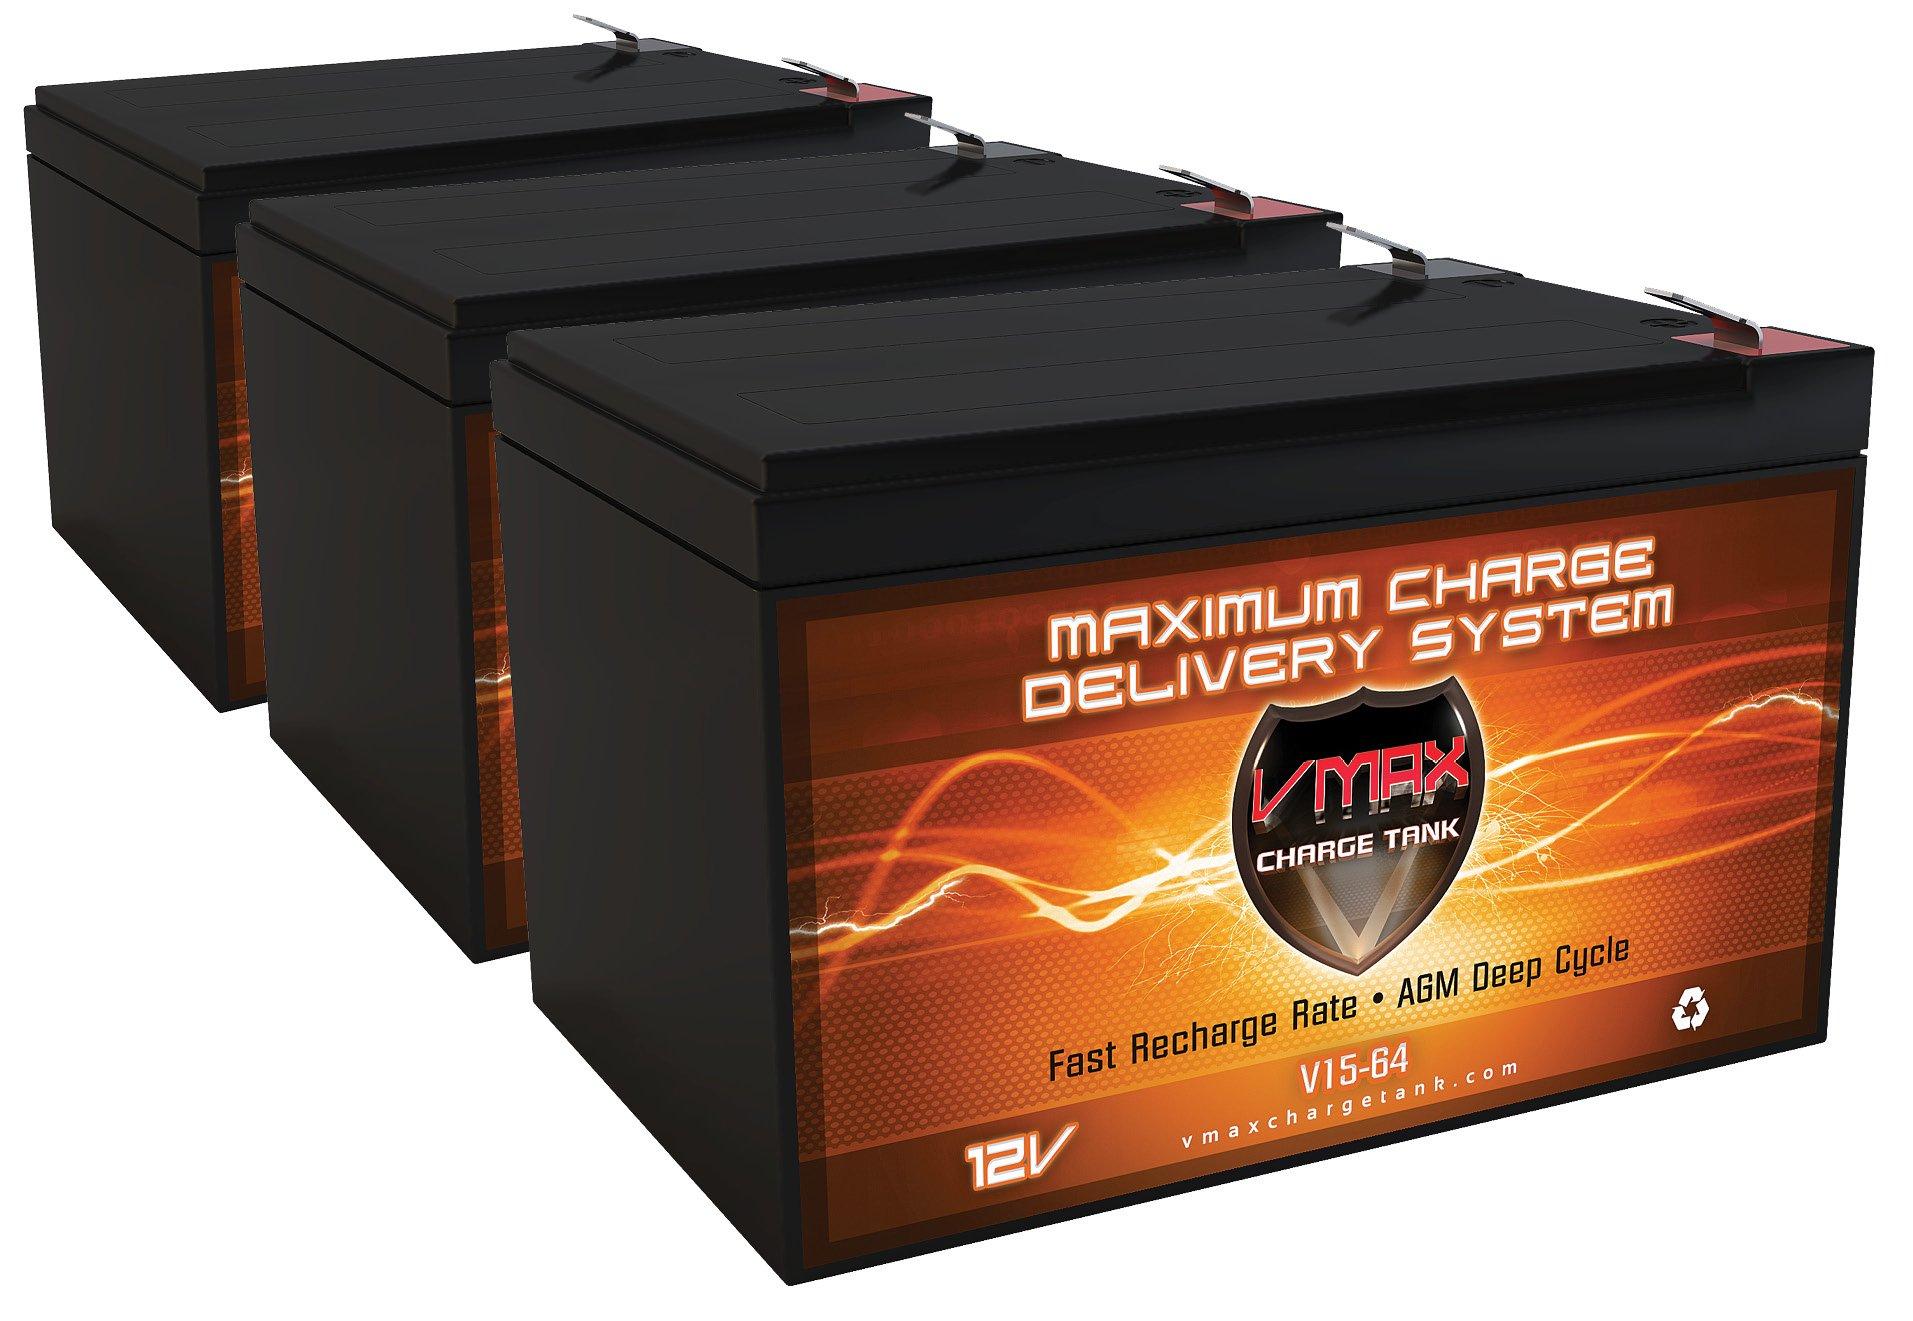 QTY 3 VMAX64 12V 15Ah AGM Deep Cycle top quality Battery for Razor MX500 MX650